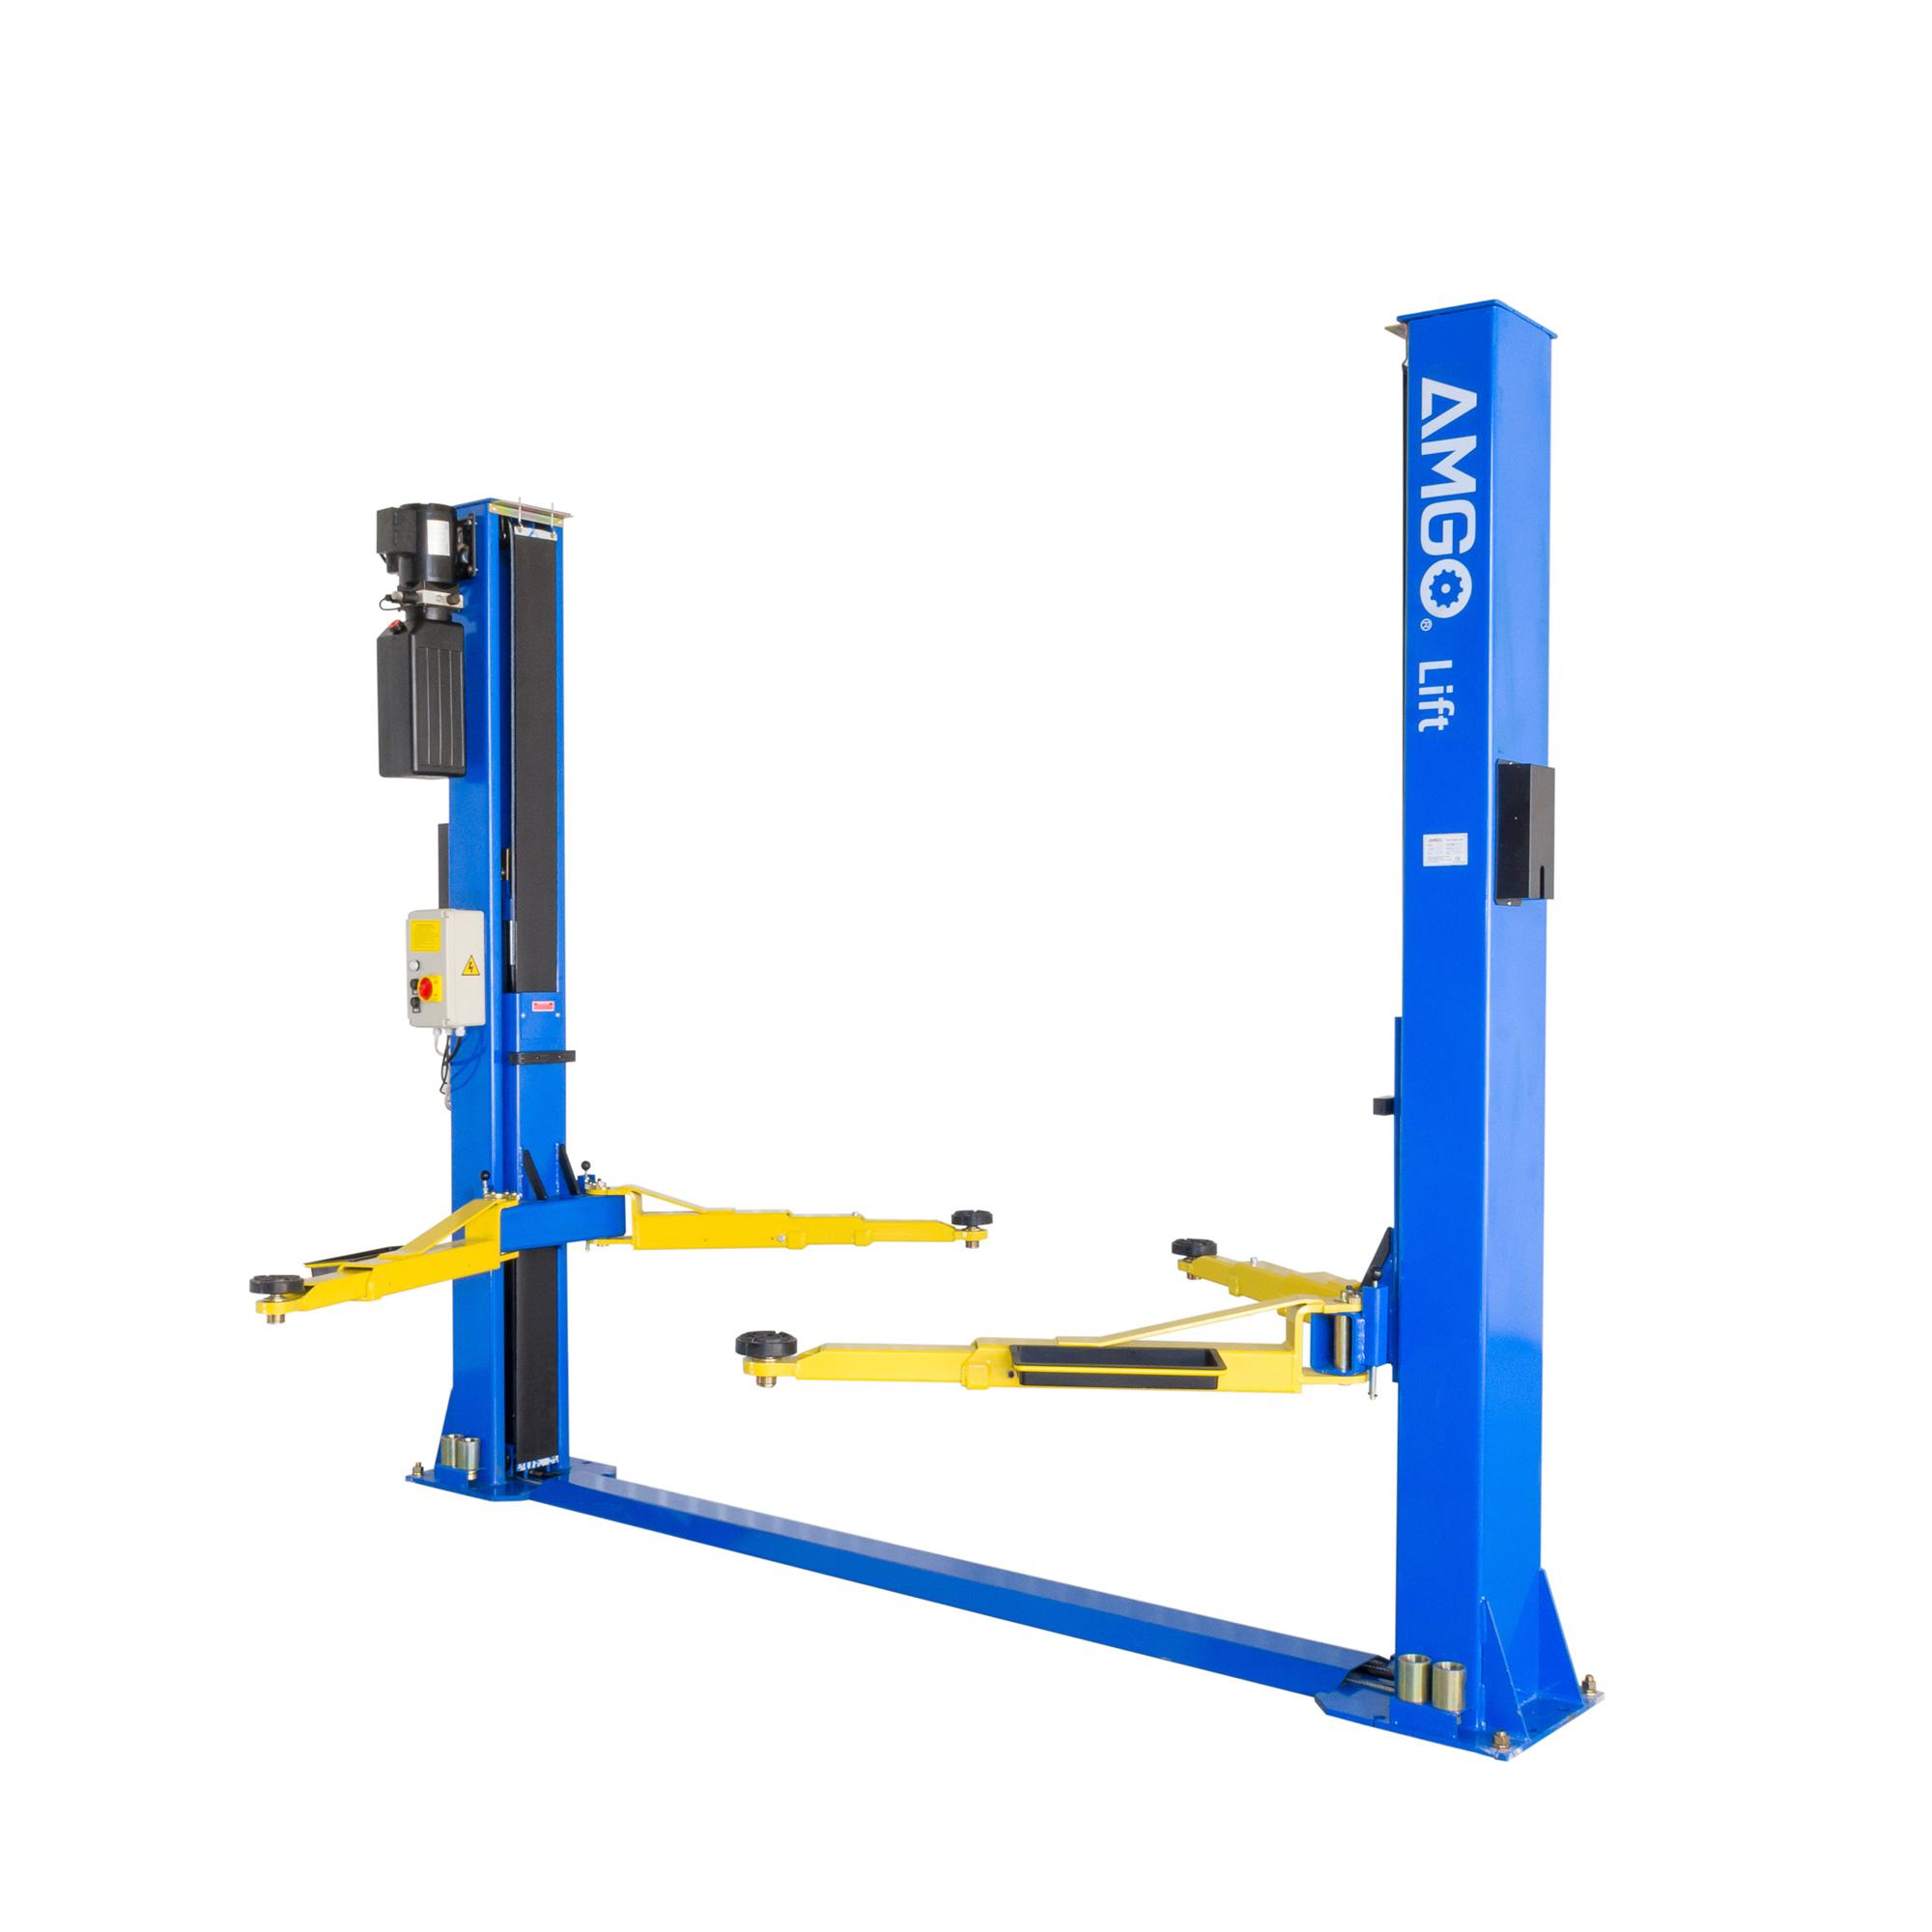 Tractor Lift Arm Extension : Peak amgo hi spec post baseplate lift garage ramp e g a